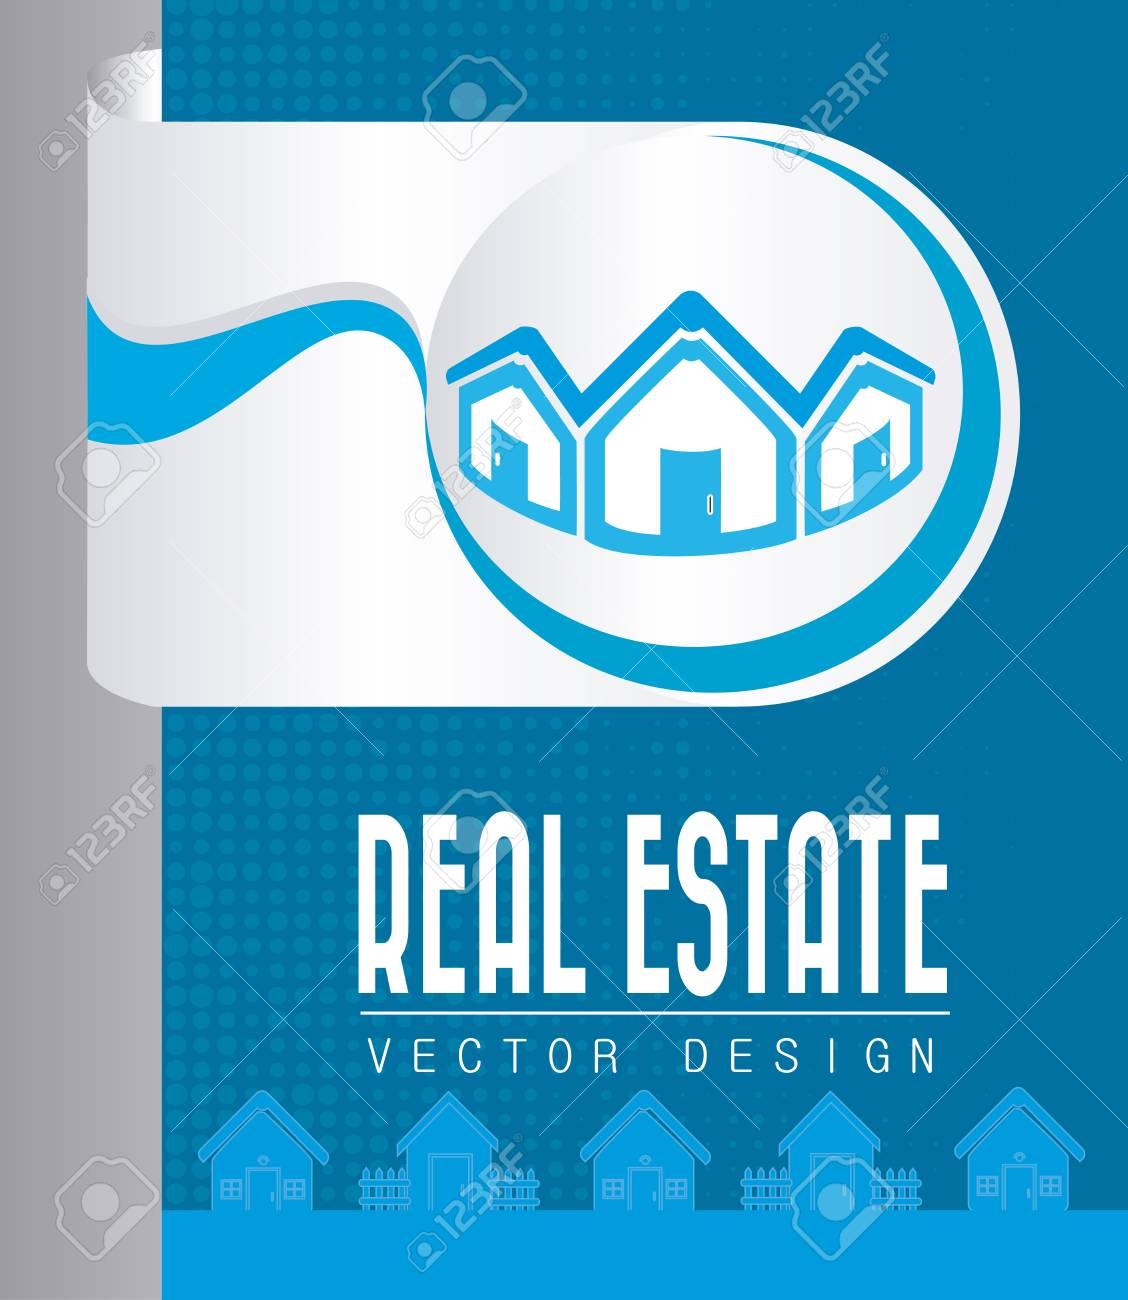 real estate design over blue background vector illustration Stock Vector - 20500430